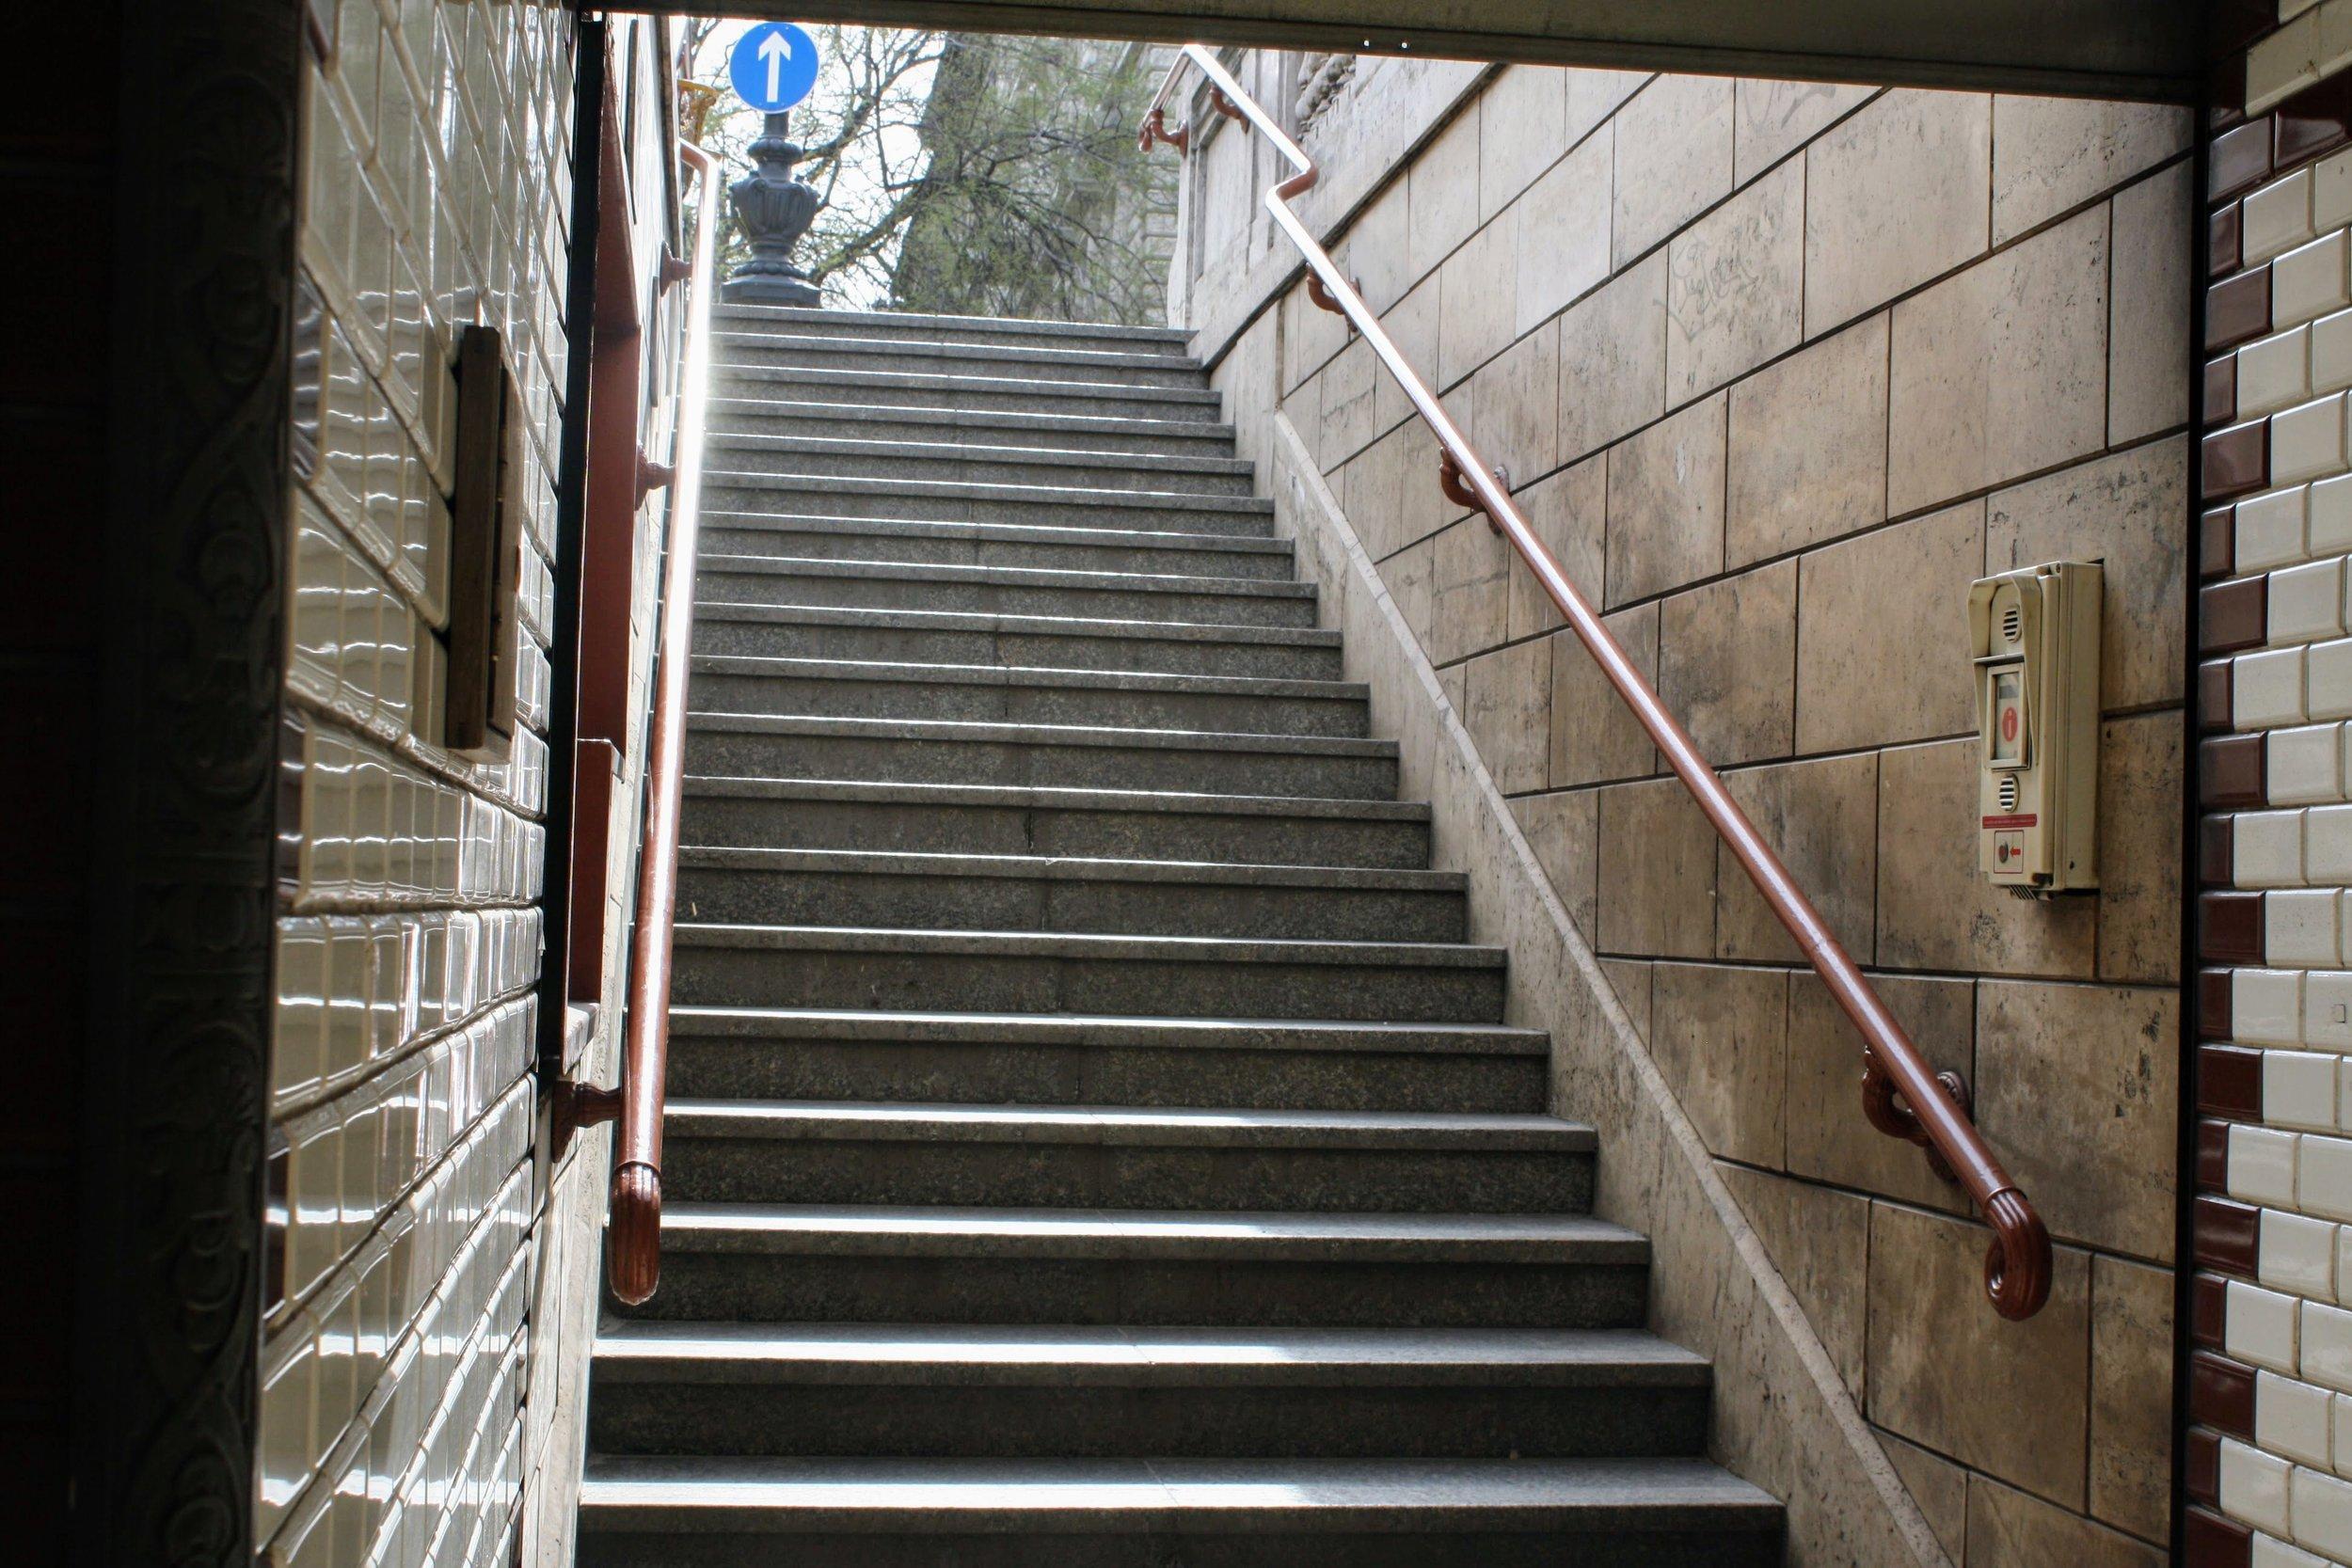 Budapest subway system